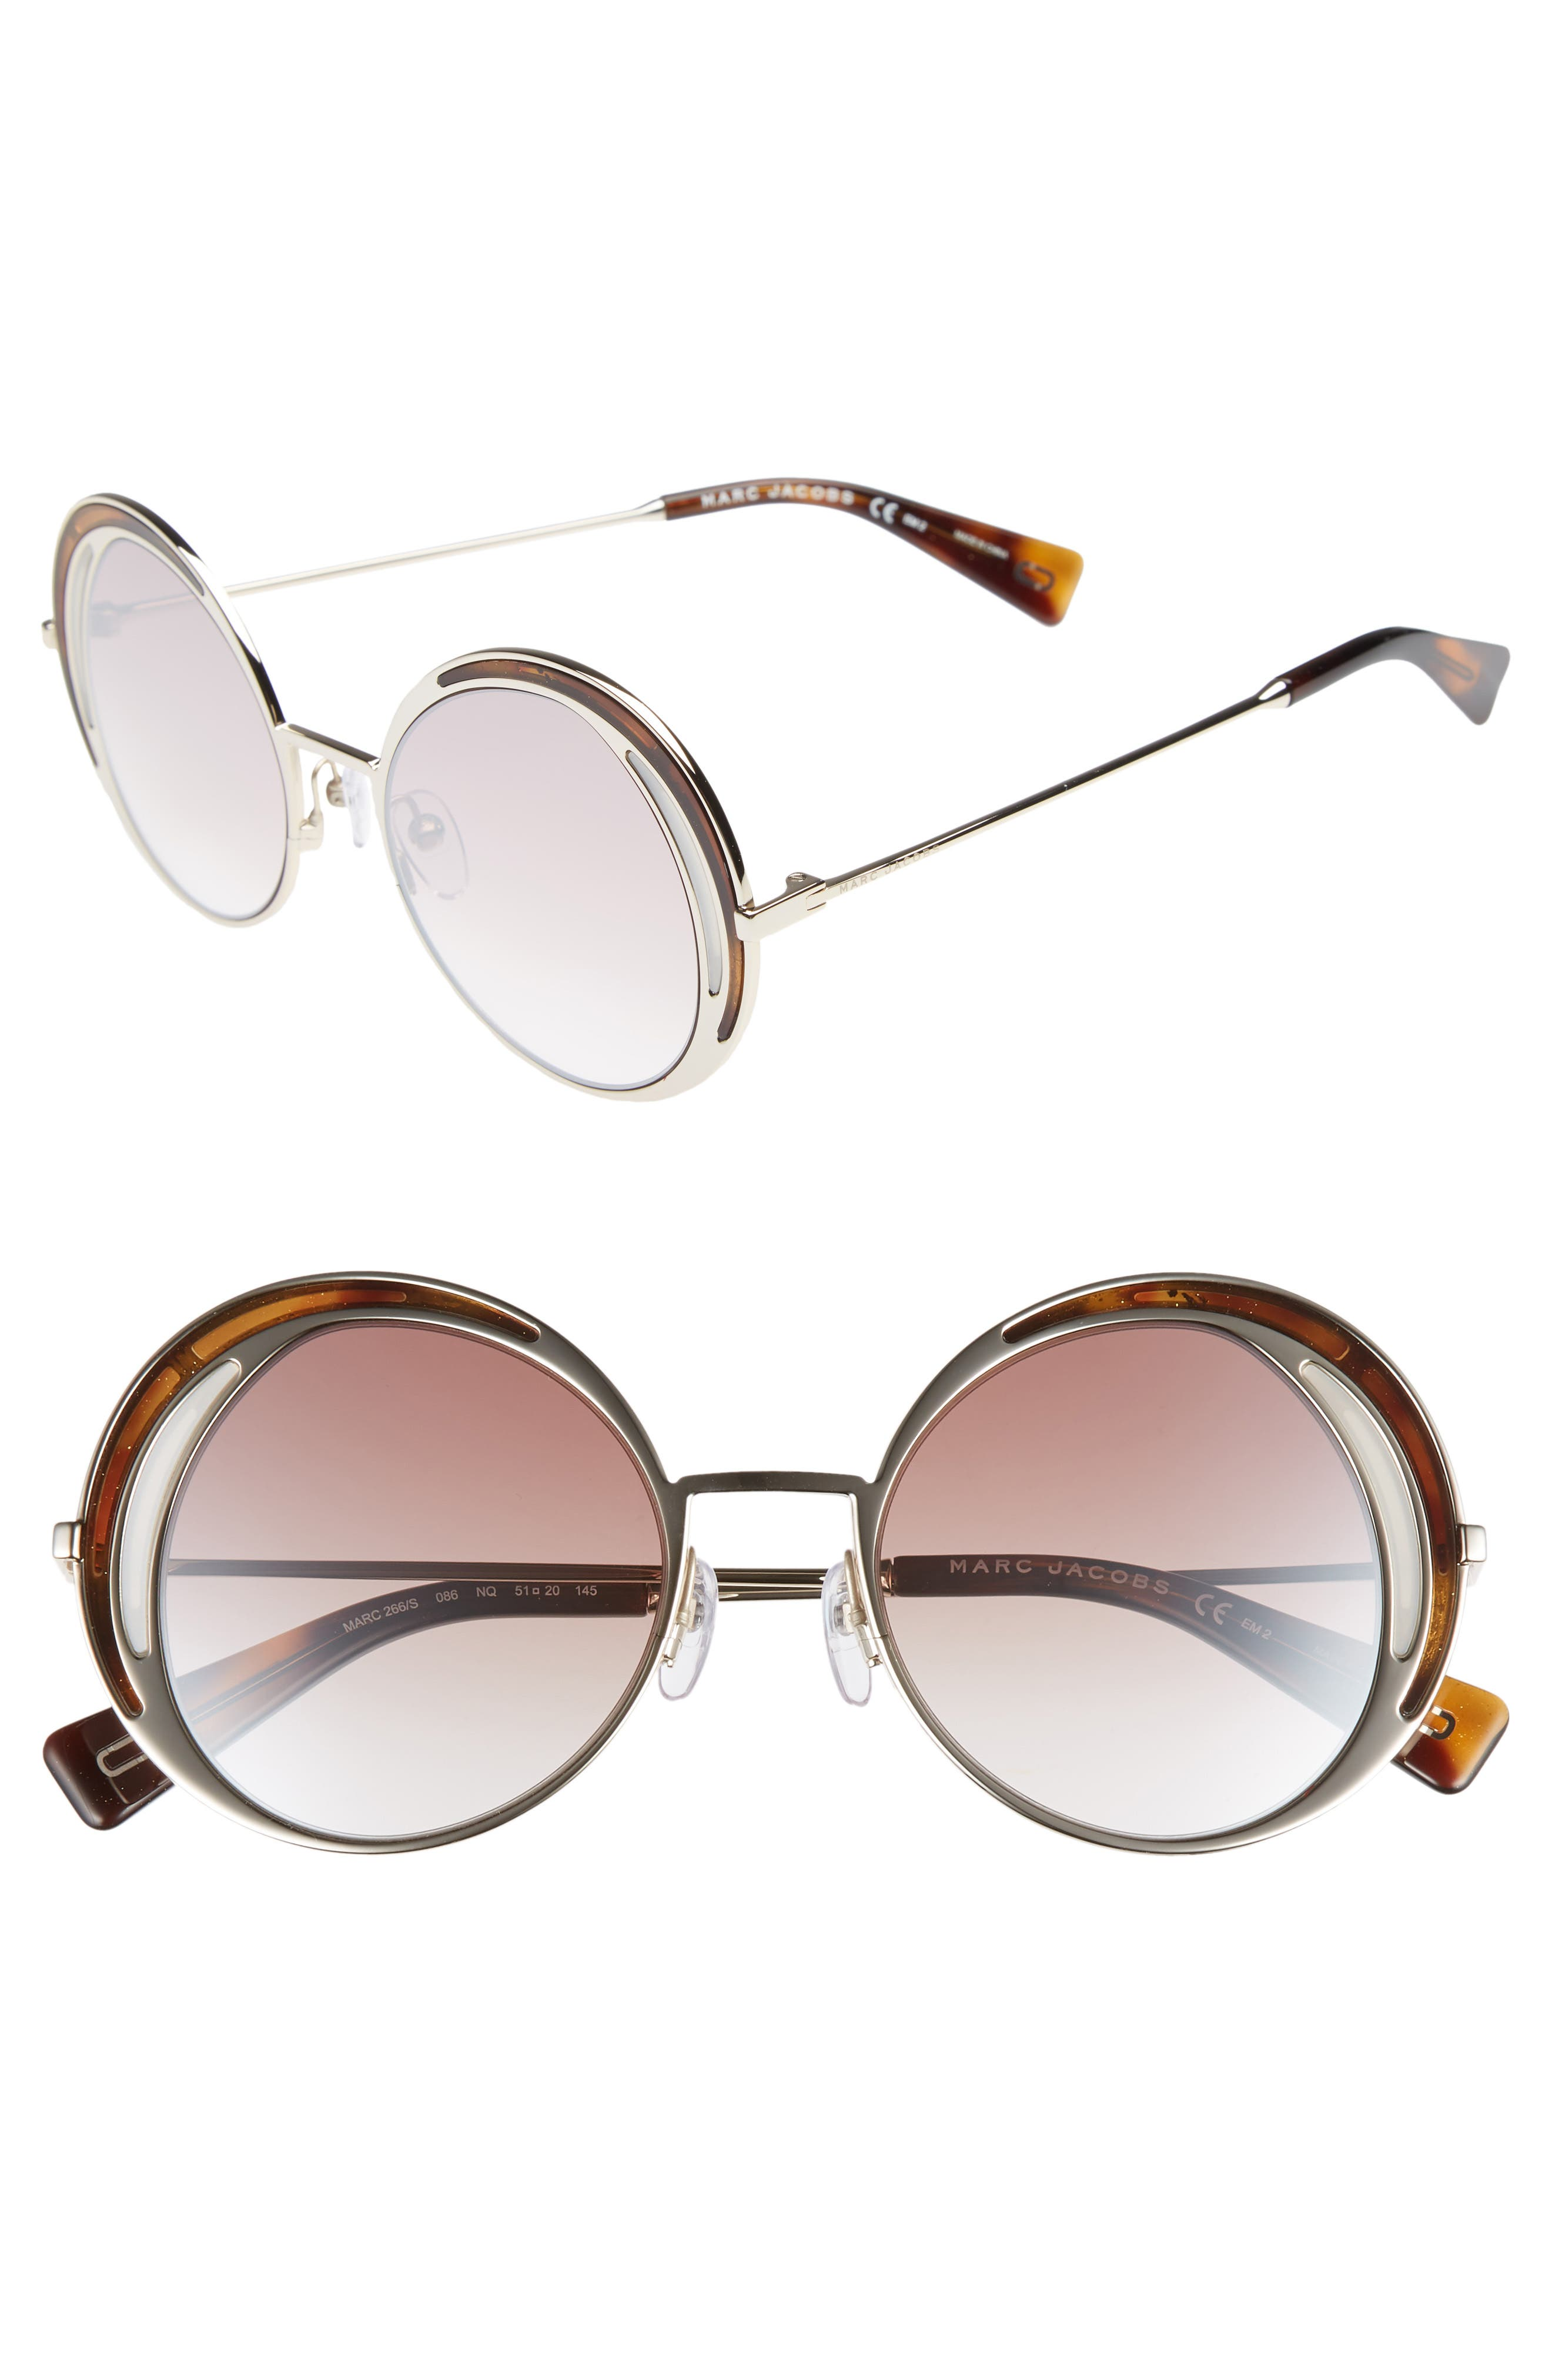 MARC JACOBS,                             51mm Round Sunglasses,                             Main thumbnail 1, color,                             DARK HAVANA/ GOLD